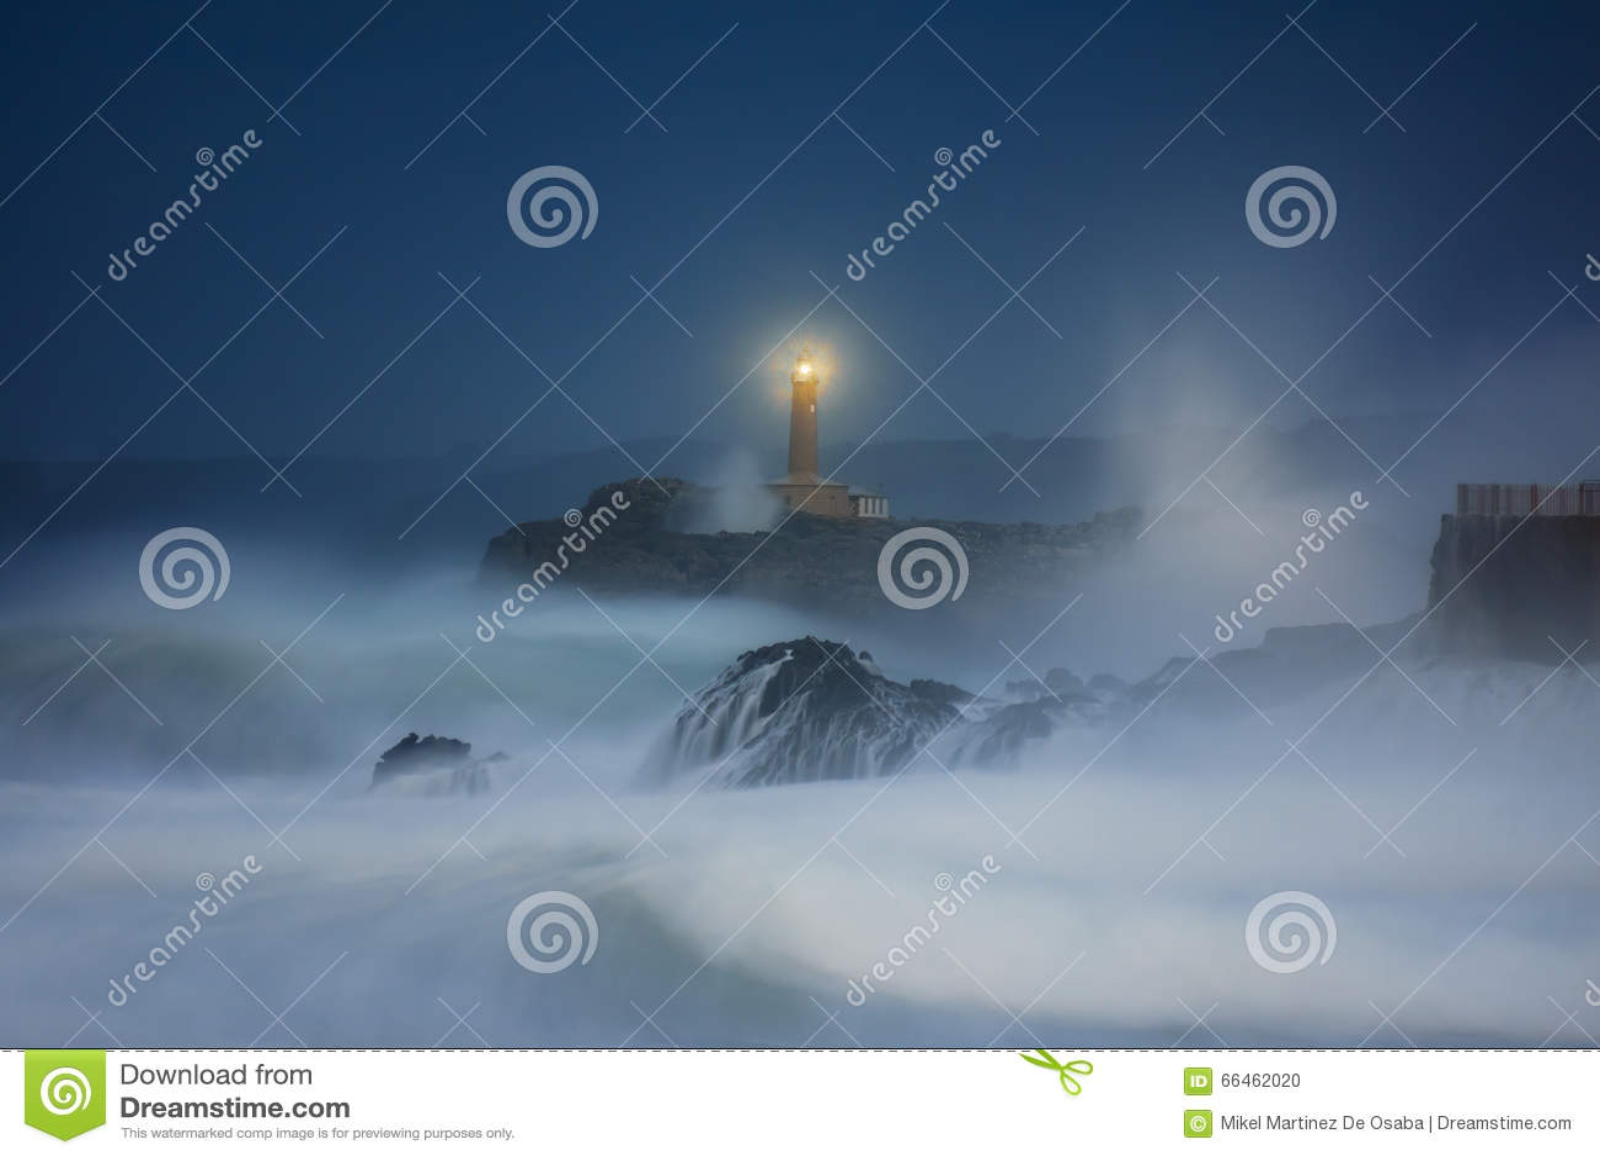 Mouro灯塔在桑坦德在晚上